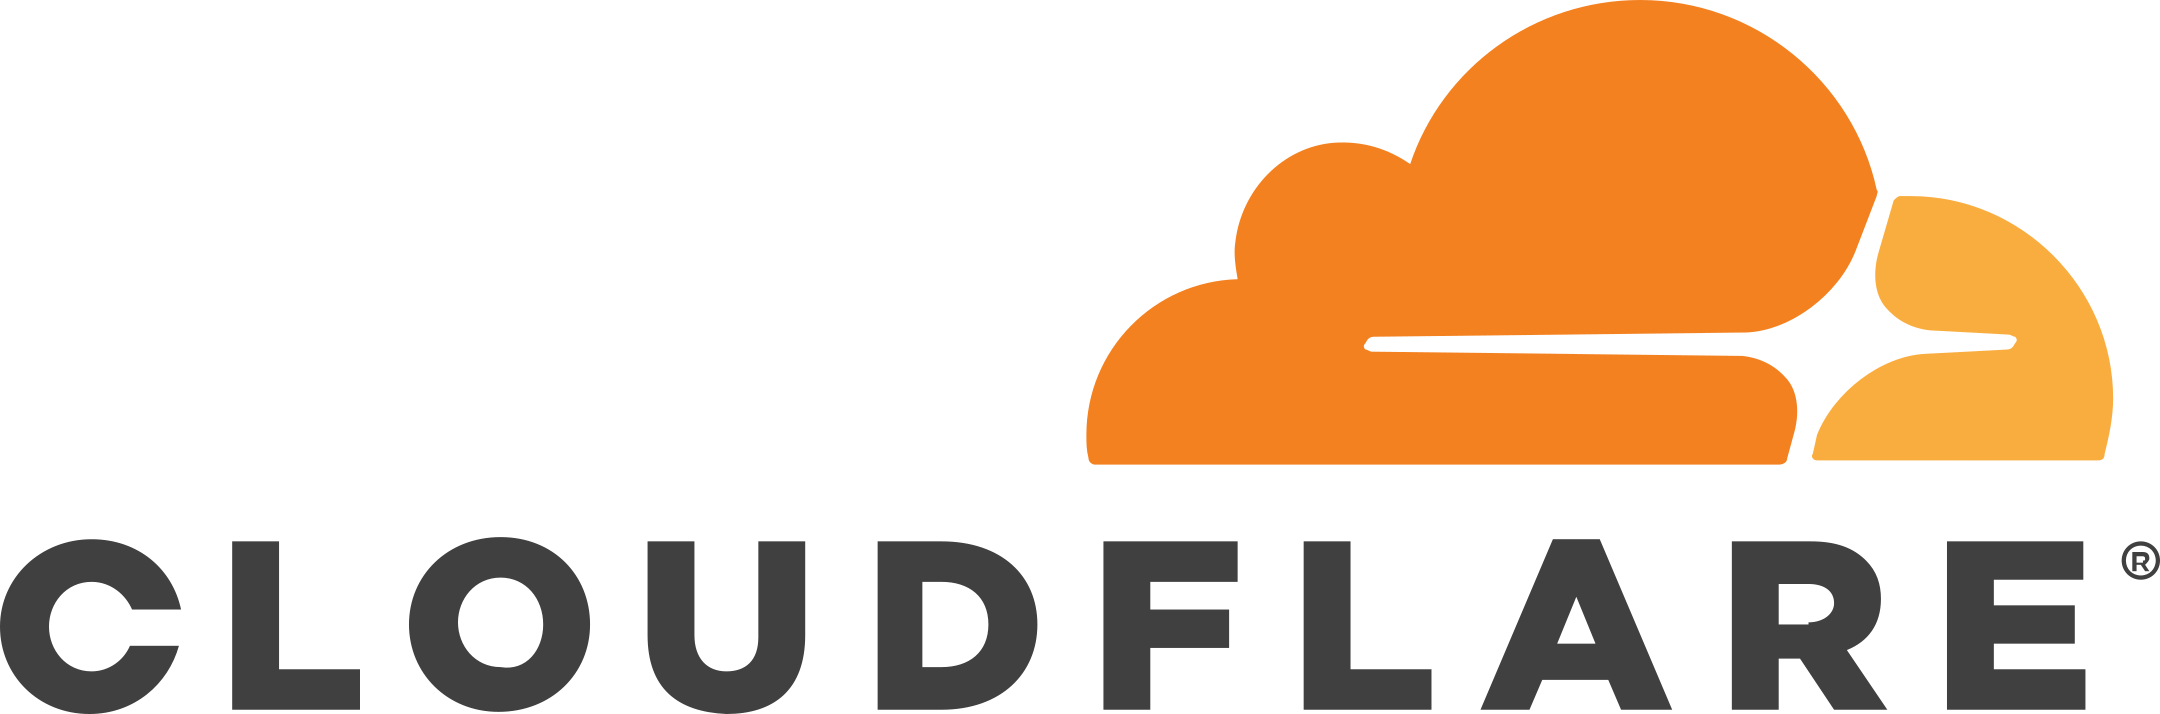 cloudflare logo 1 1 - Cloudflare Logo